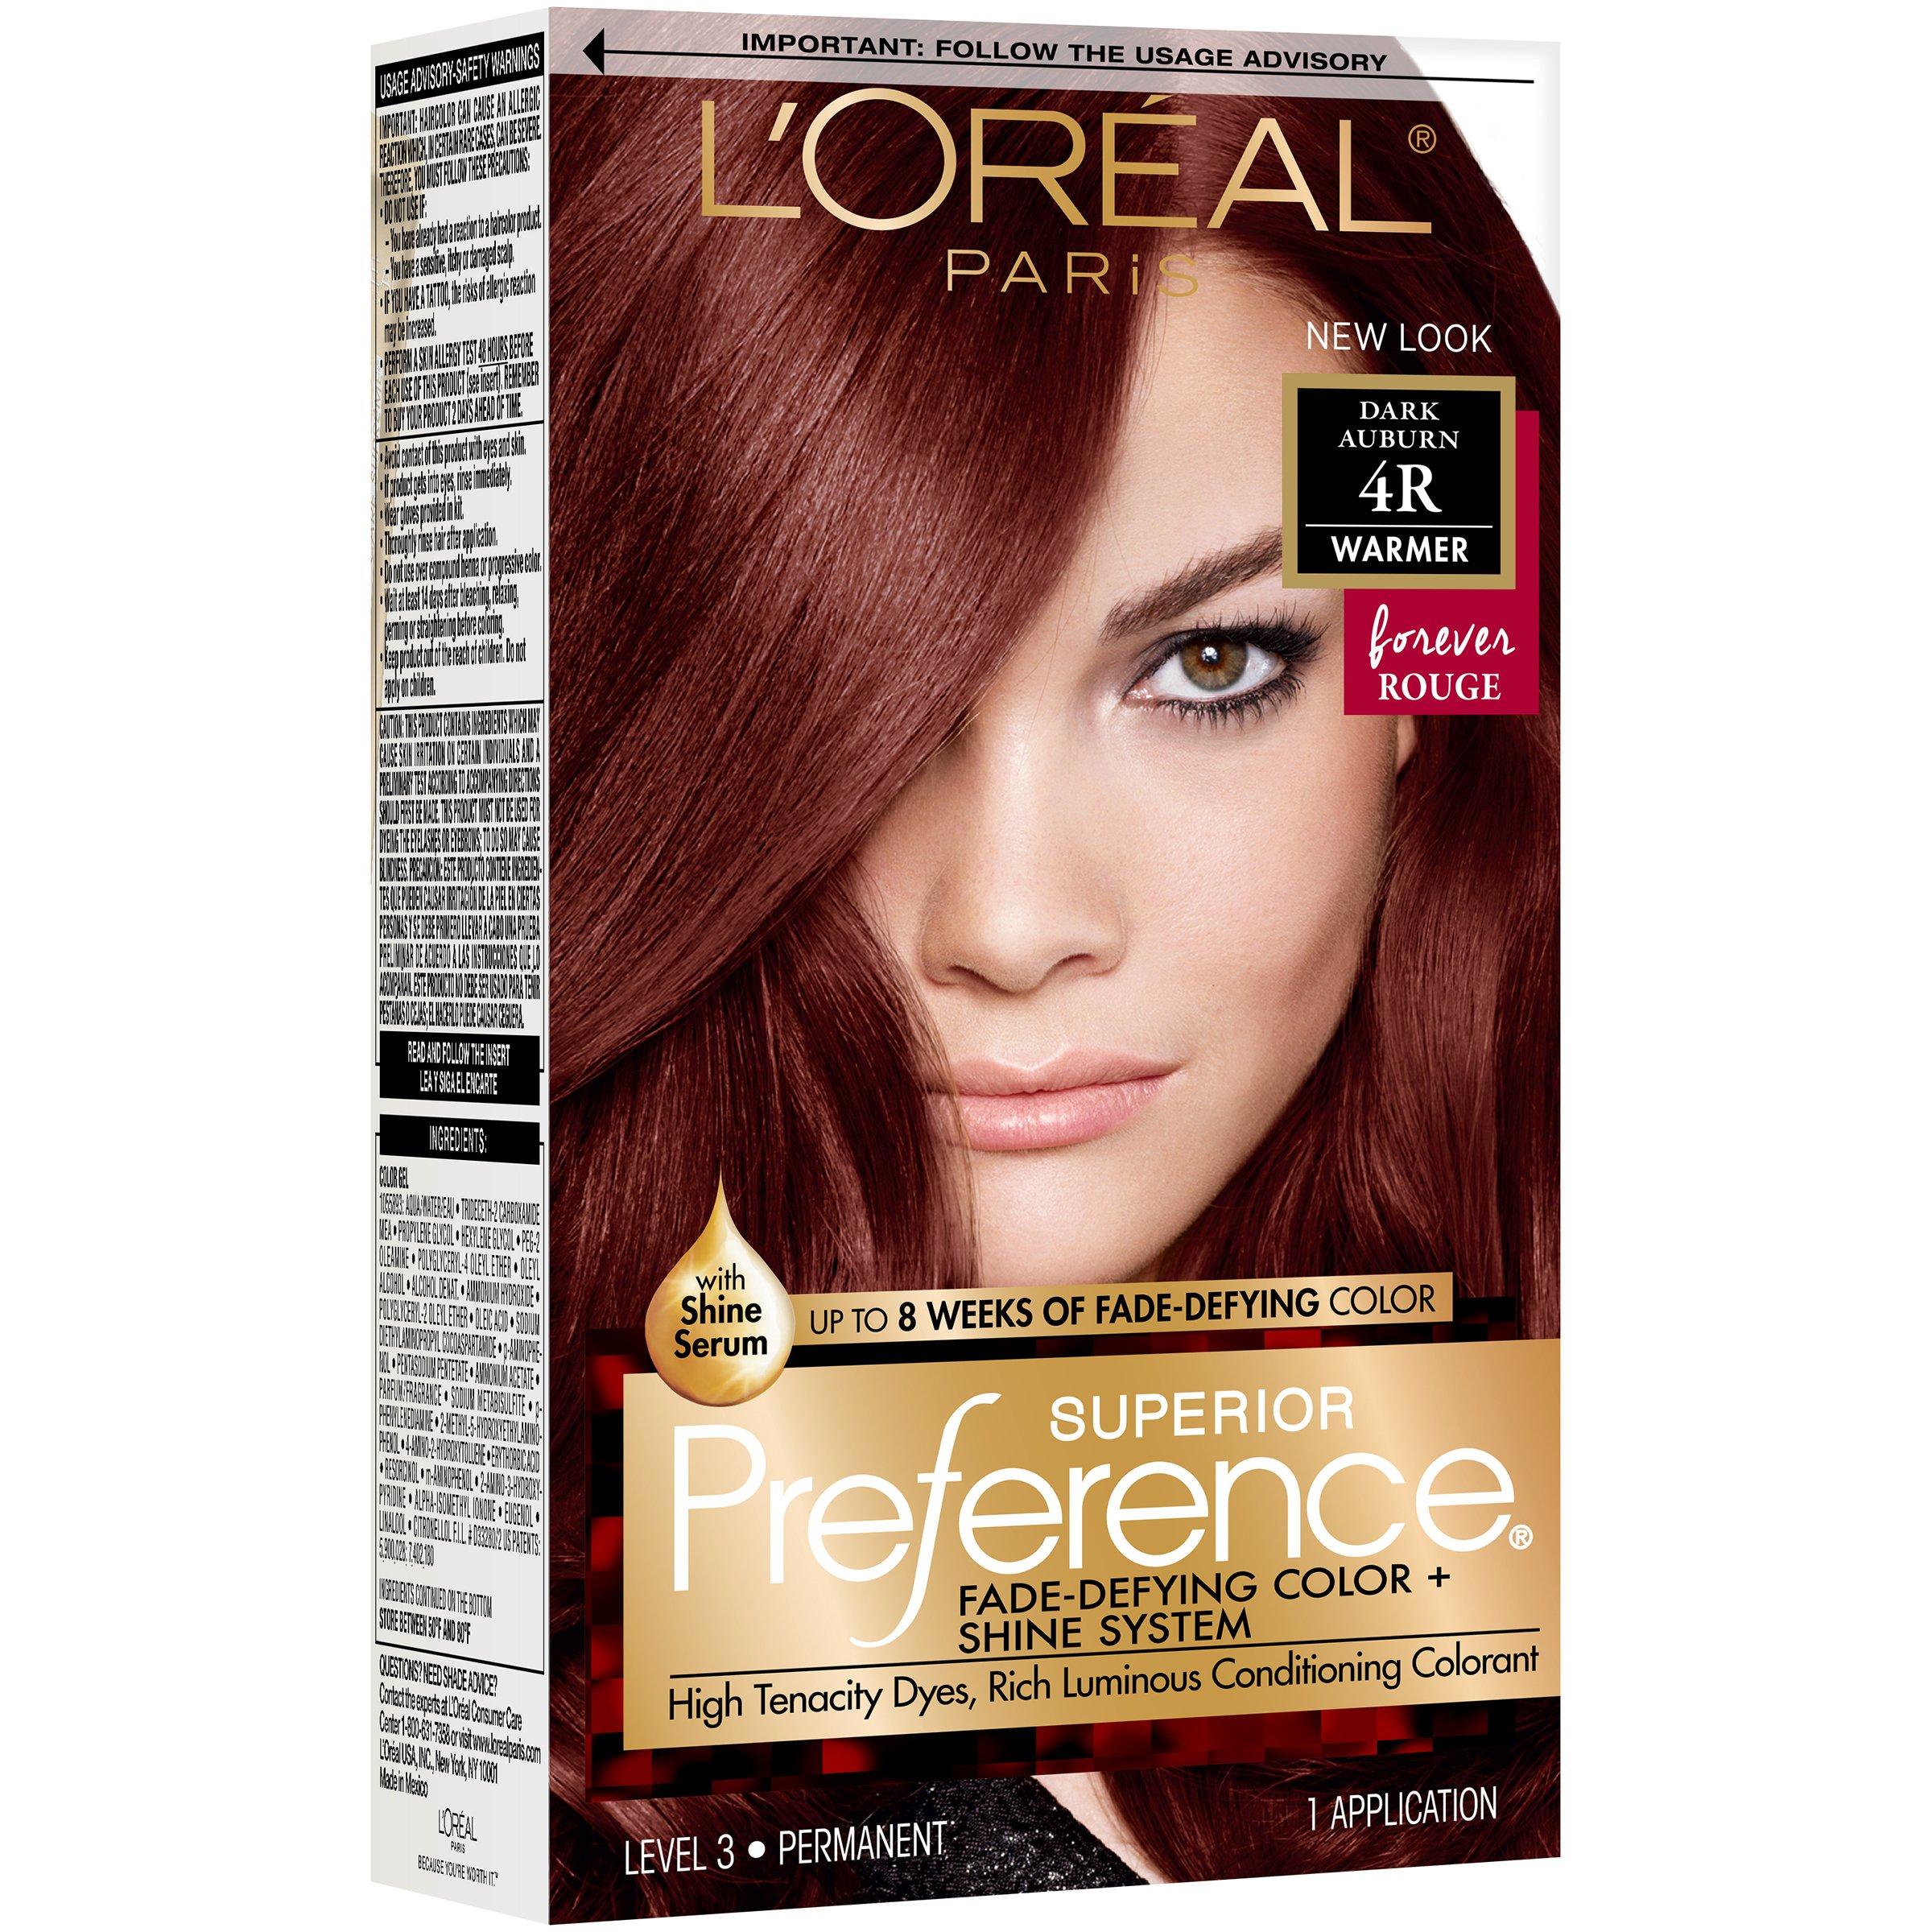 L'Oreal Paris Superior Preference Permanent Hair Color, 9R Dark Auburn